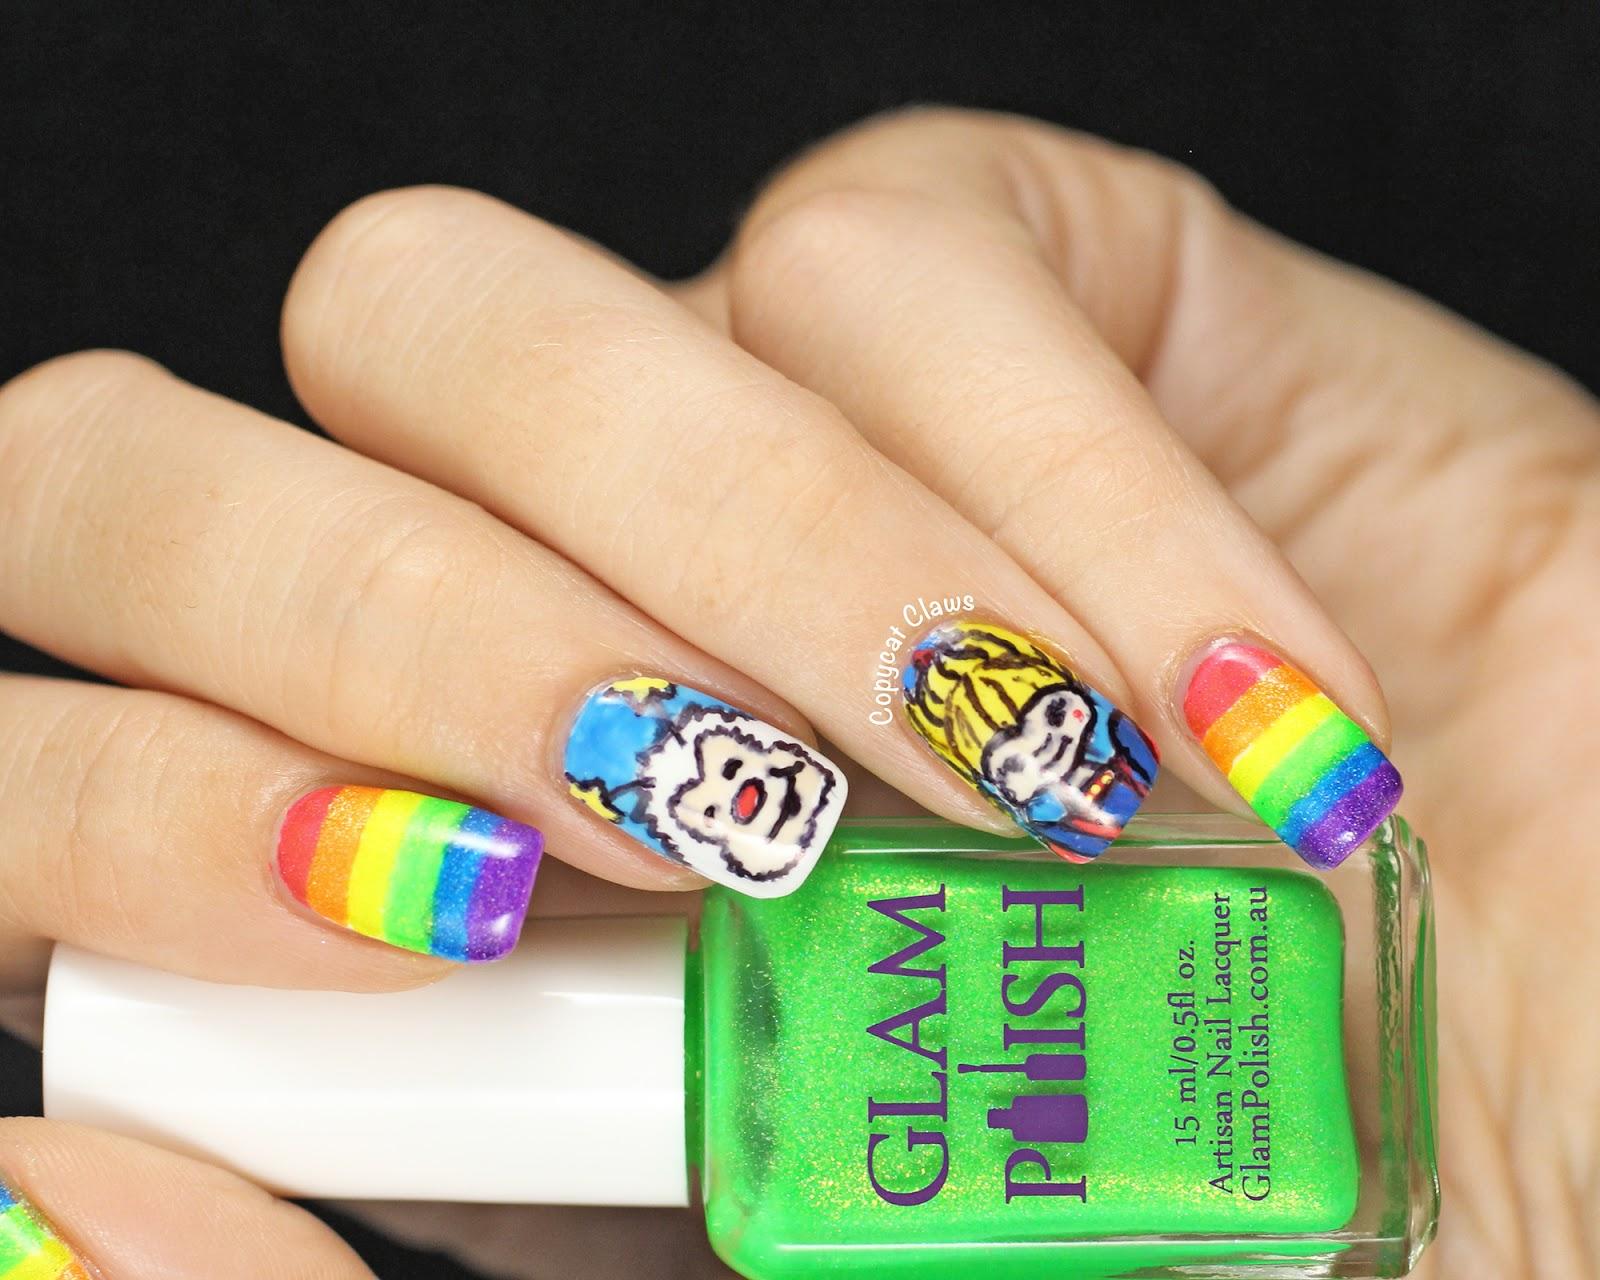 Copycat Claws 31dc2014 Day 9 Rainbow Brite Nail Art